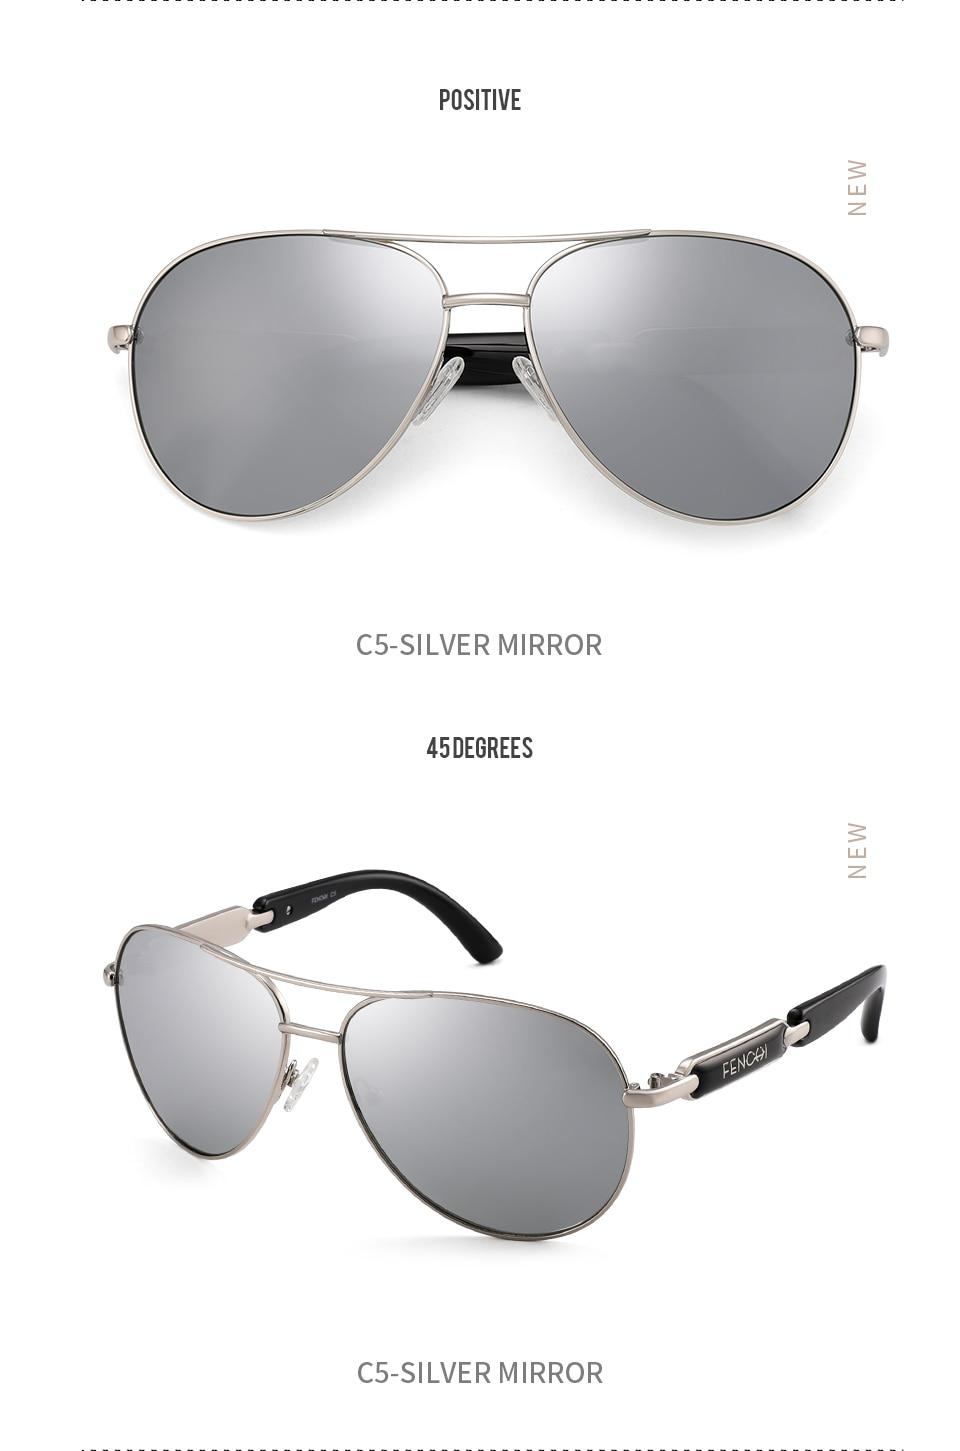 H09f322b77e224ef398919db37d623acdo FENCHI Polarized Sunglasses Women Vintage Brand Glasses Driving Pilot Pink Mirror sunglasses Men ladies oculos de sol feminino